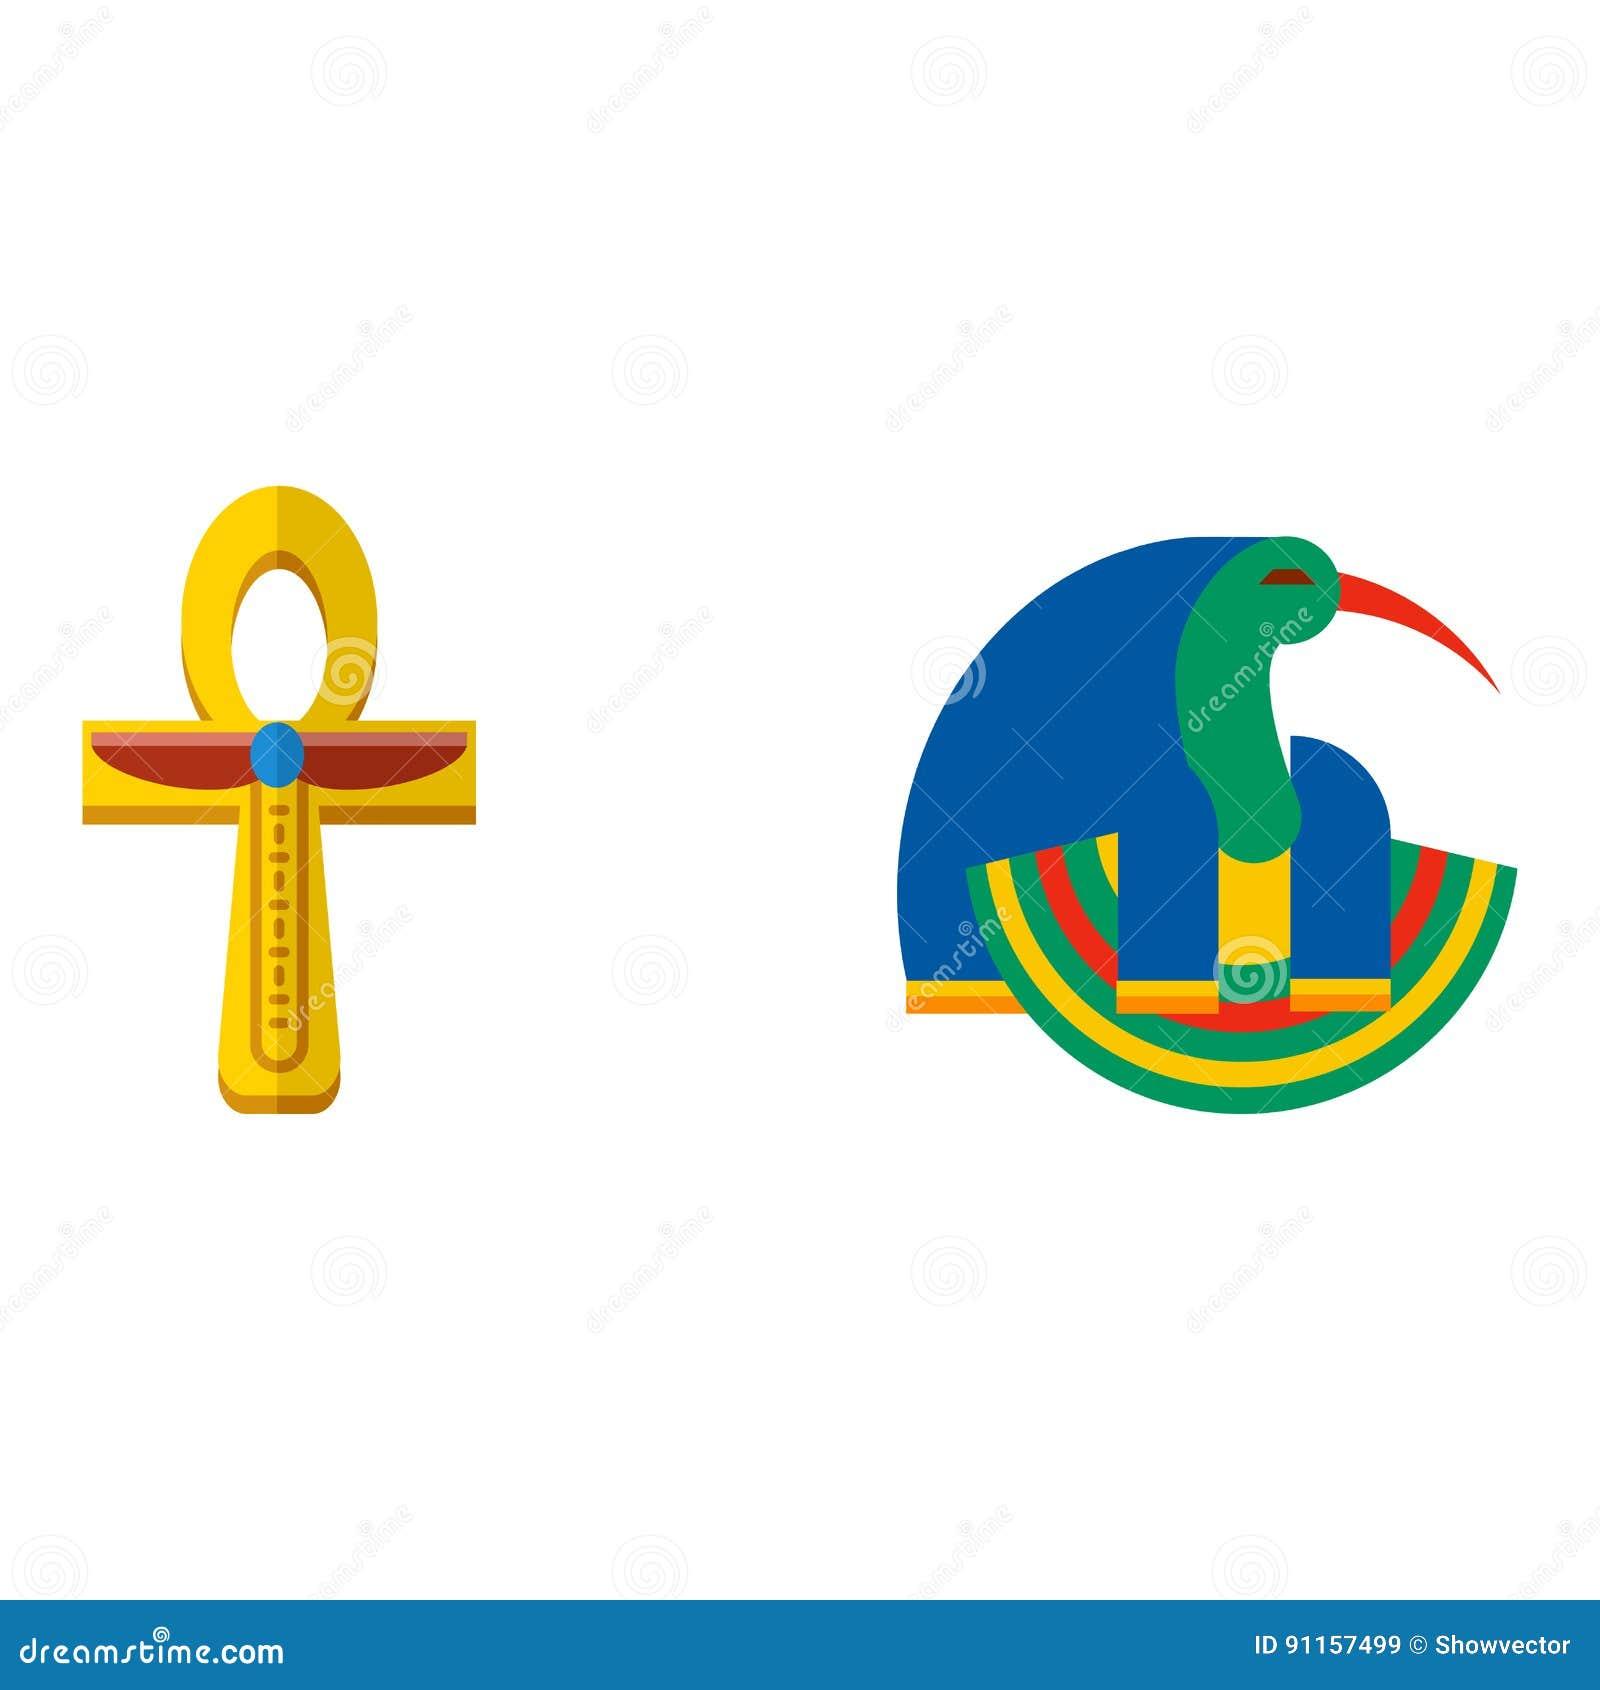 Egypt gods amun ra historic famous antique travel karnak ancient egypt gods amun ra historic famous antique travel karnak ancient pharaoh religion vector illustration buycottarizona